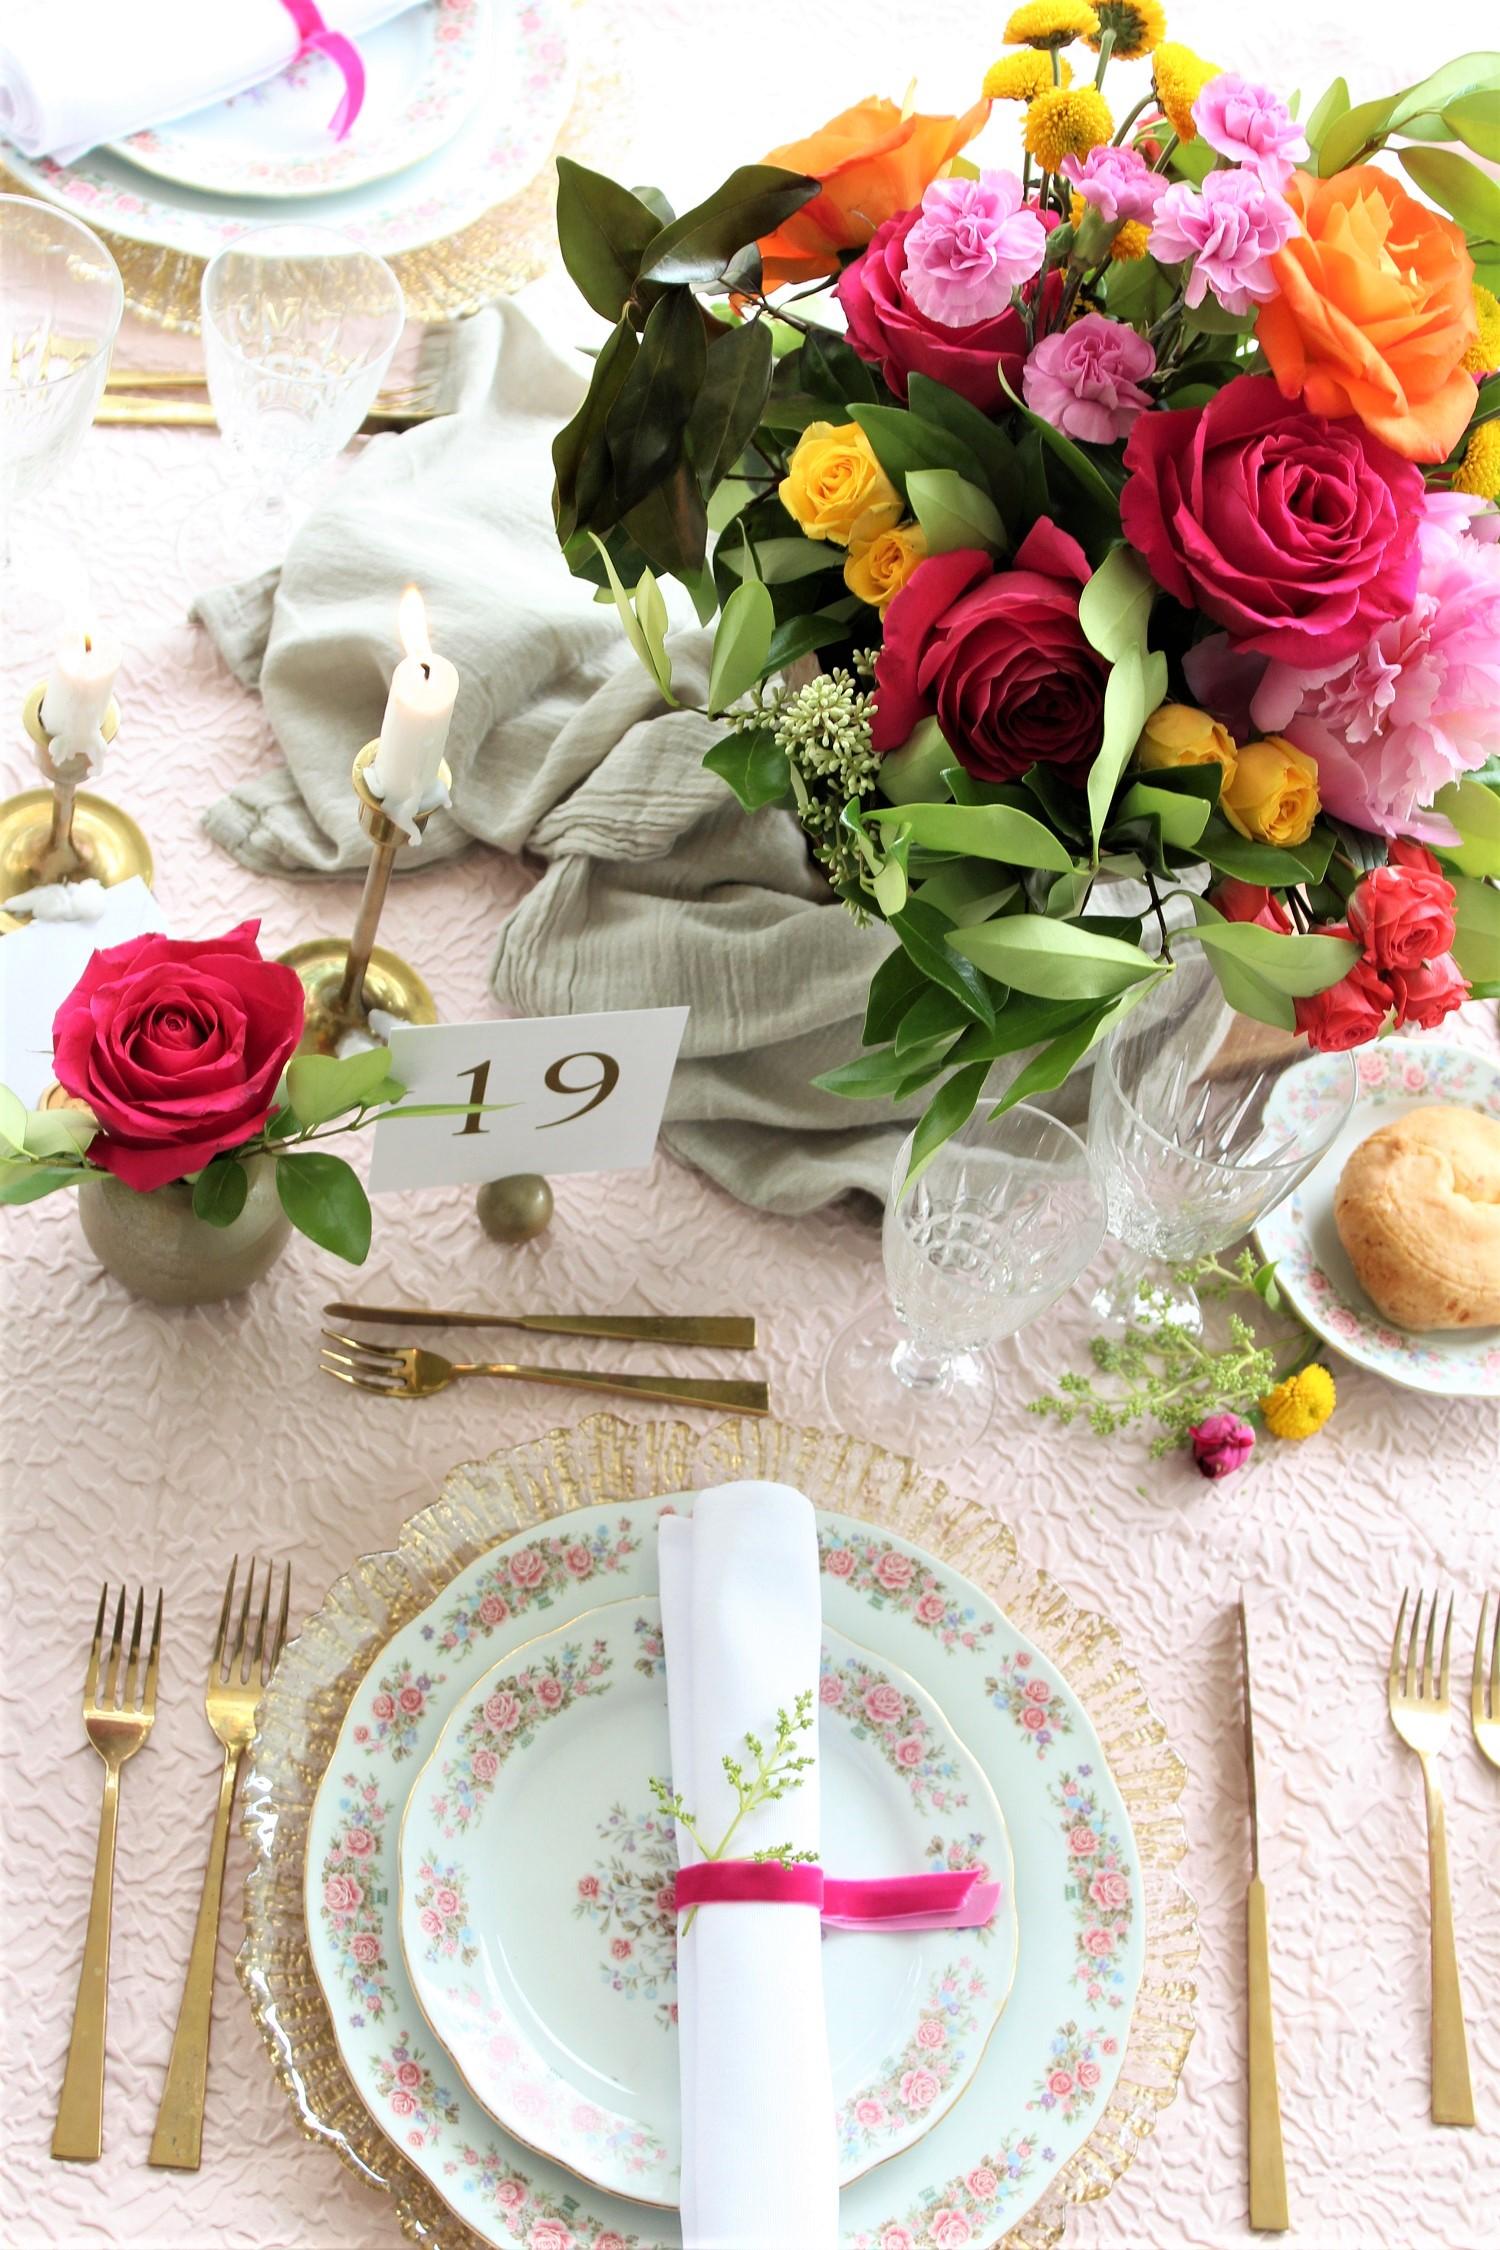 all-that-glam-wedding planning - floral- design- dallas